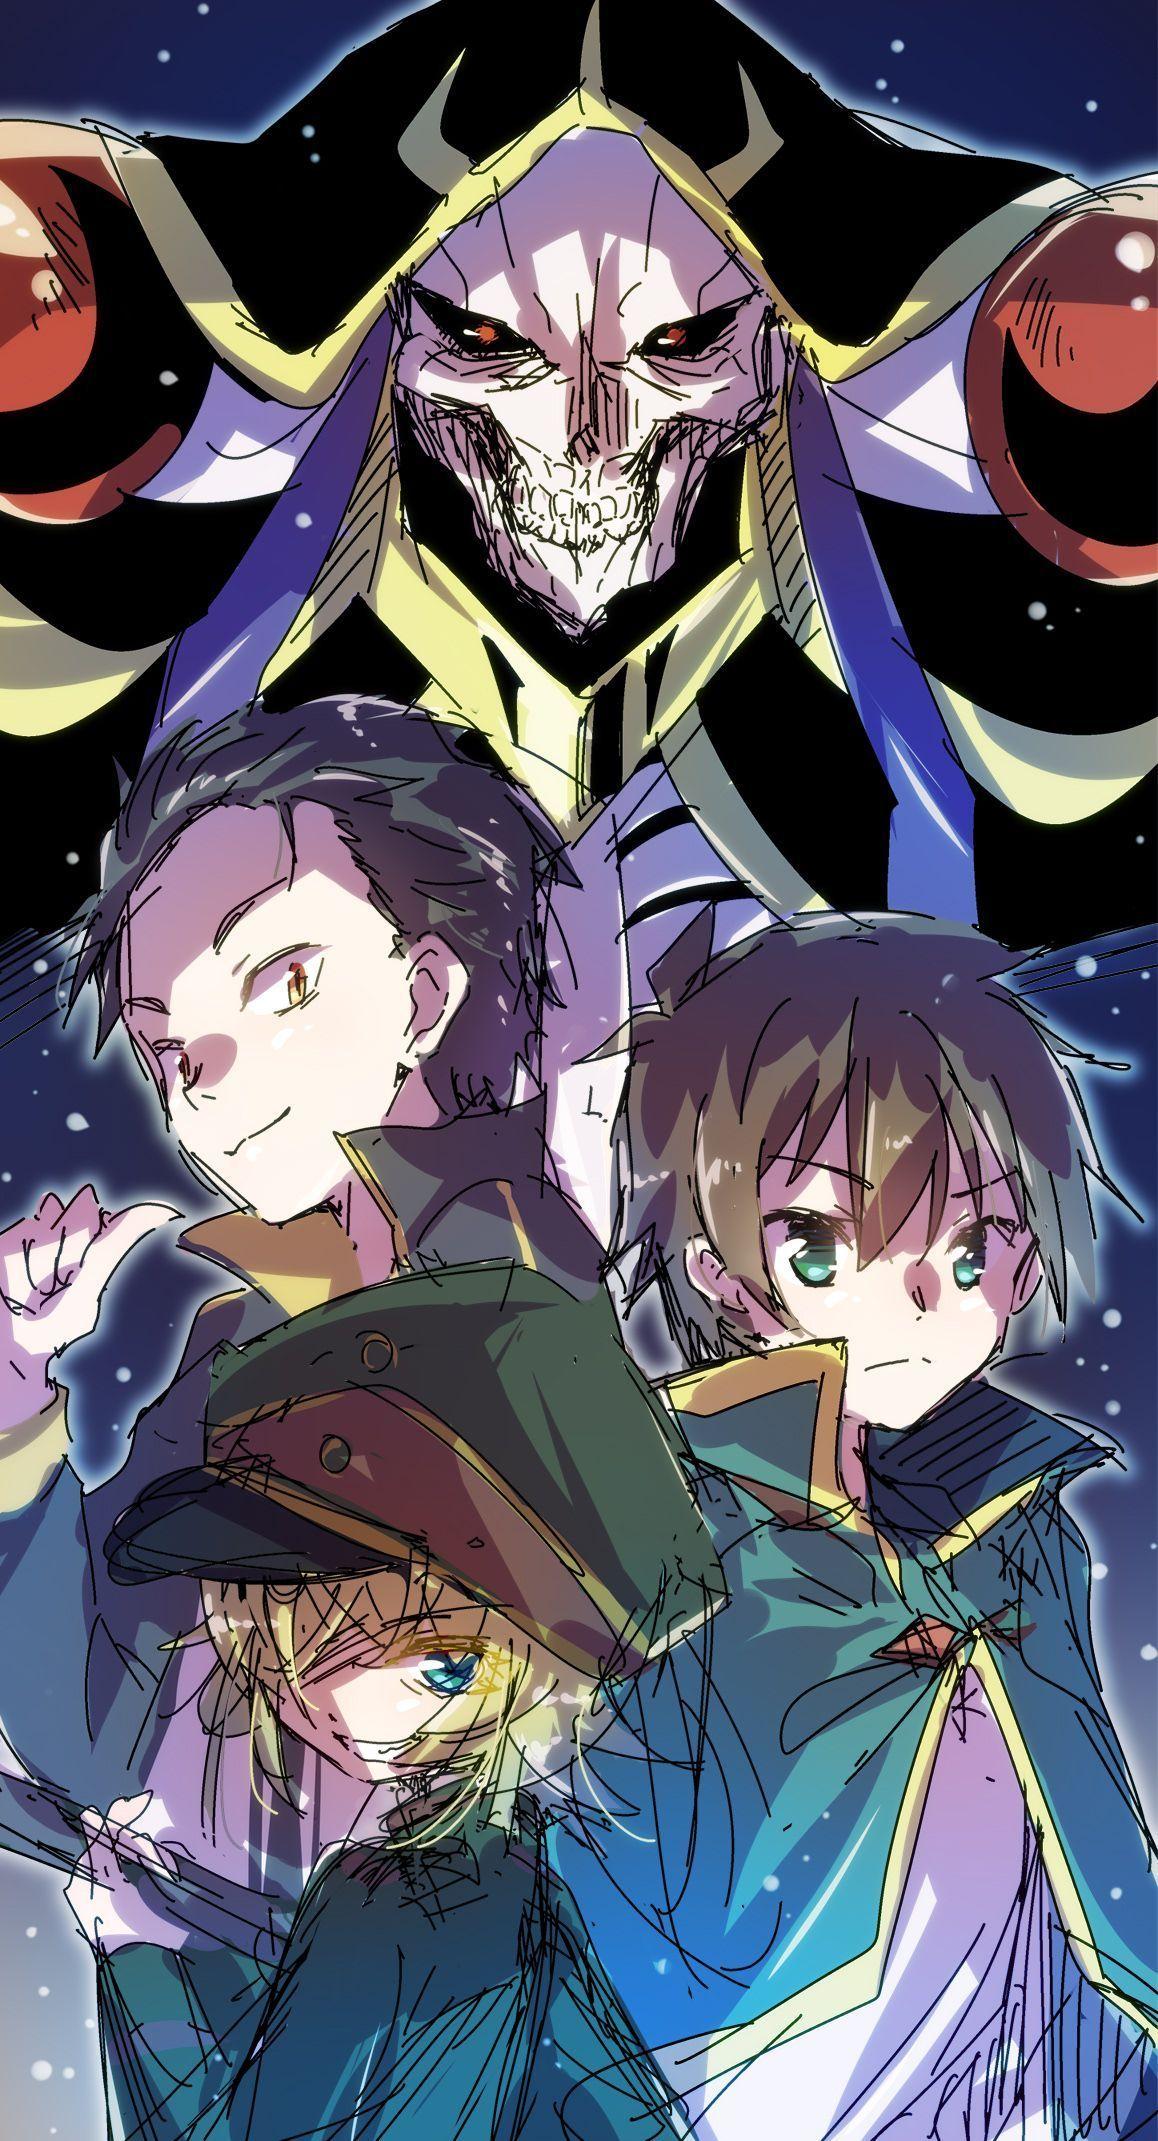 Isekai Quartet Anime in 2020 Anime crossover, Anime